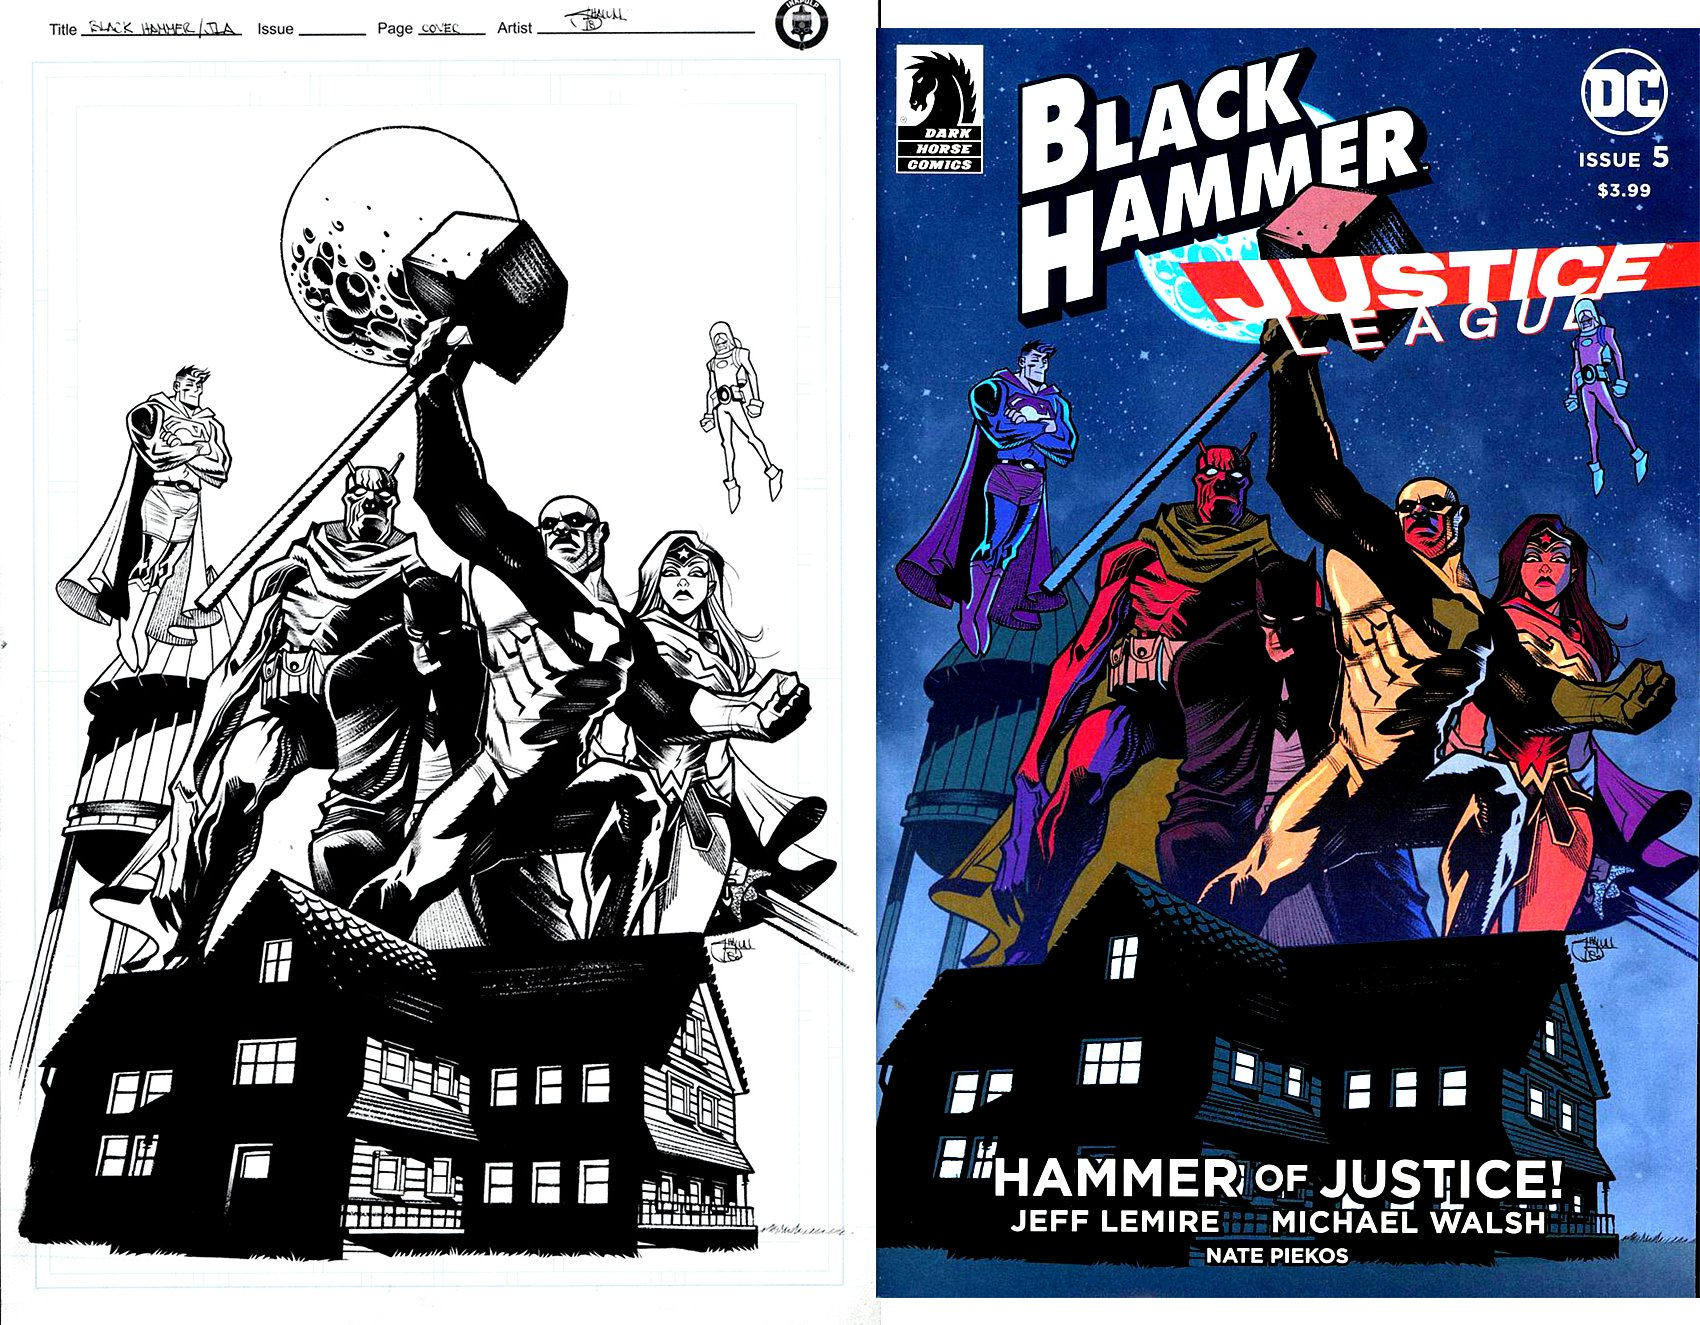 Justice League: Hammer of Justice! #5 Cover (Batman, Wonder Woman, Superman, Black Hammer, Barbalien, Colonel Weird!) 2019